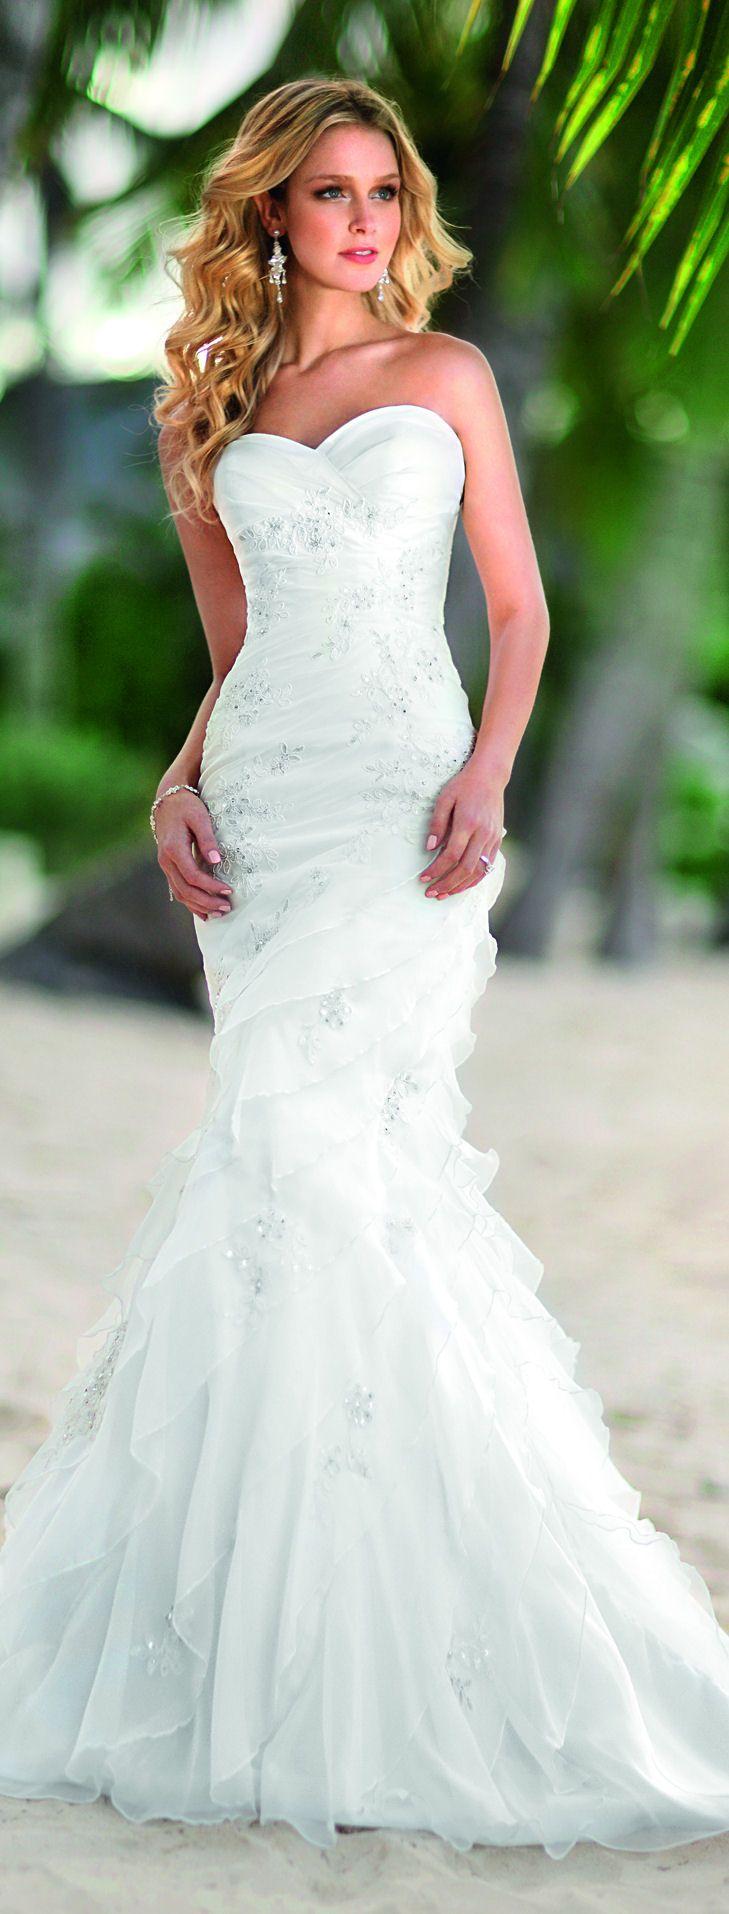 Winter wonderland wedding dress  Sweetheart Ruffle Wedding Gown   Wedding  Pinterest  Ruffles